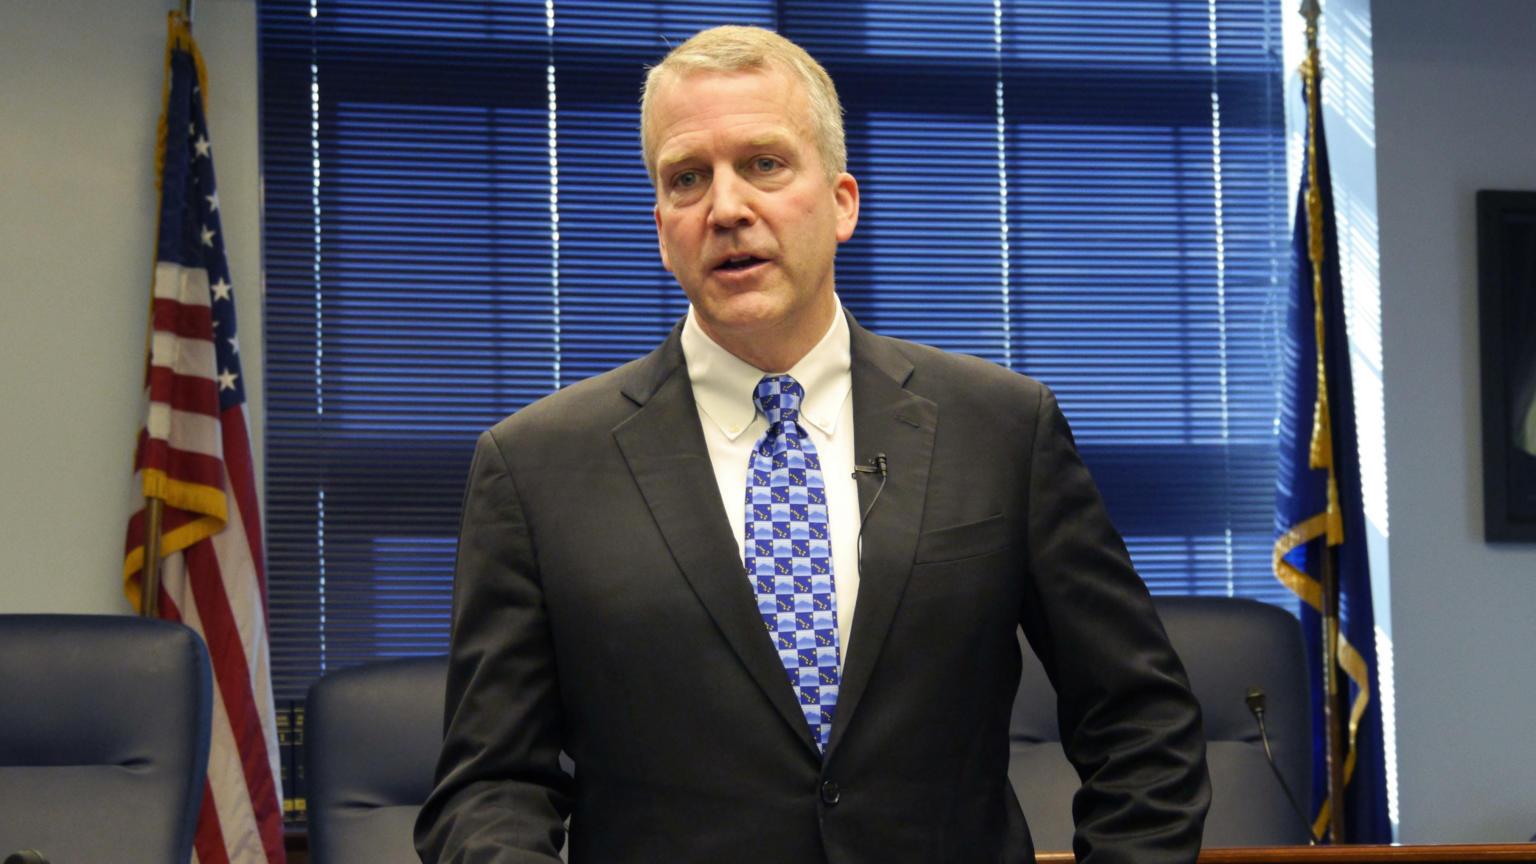 Republican Senator Dan Sullivan Wins Re-Election in Alaska, Taking U.S. Senate Battle Down to Georgia